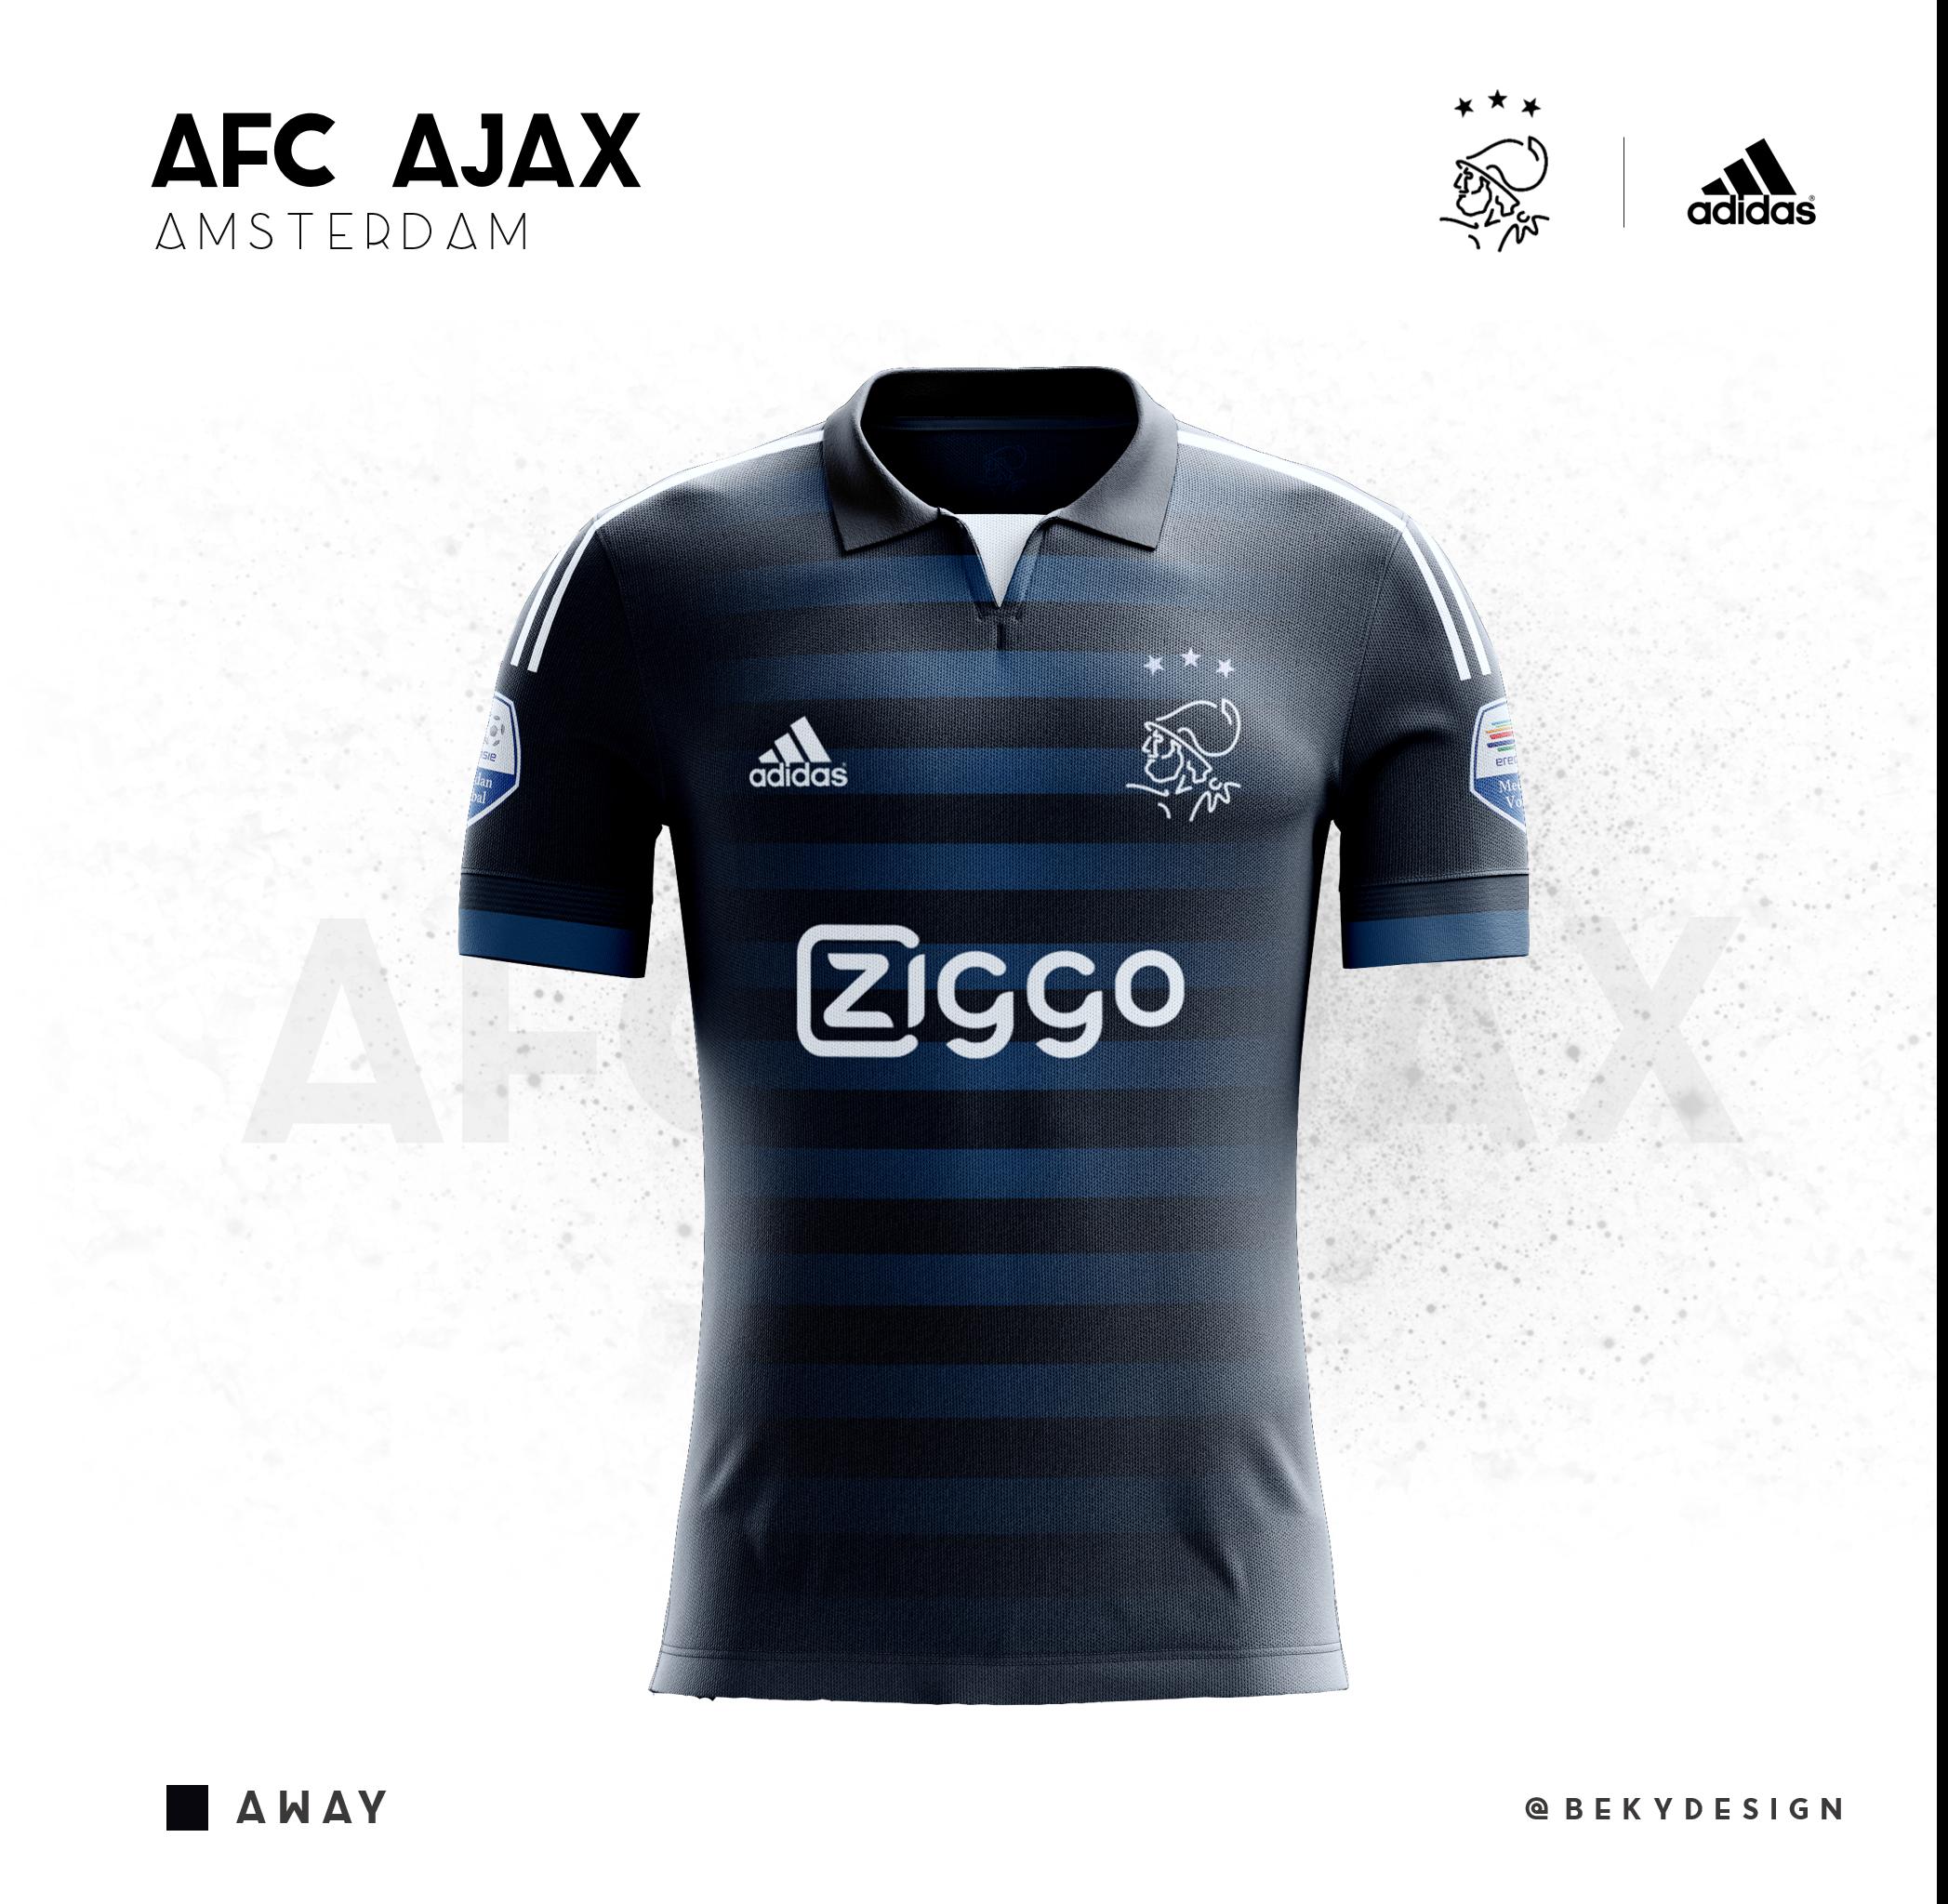 Concepts kits for 5 big teams from The Nerherlands - Ajax Amsterdam- PSV  Eindhoven- FC Twente- AZ Alkmaar- Feyenoord FC 2223d70101c7a